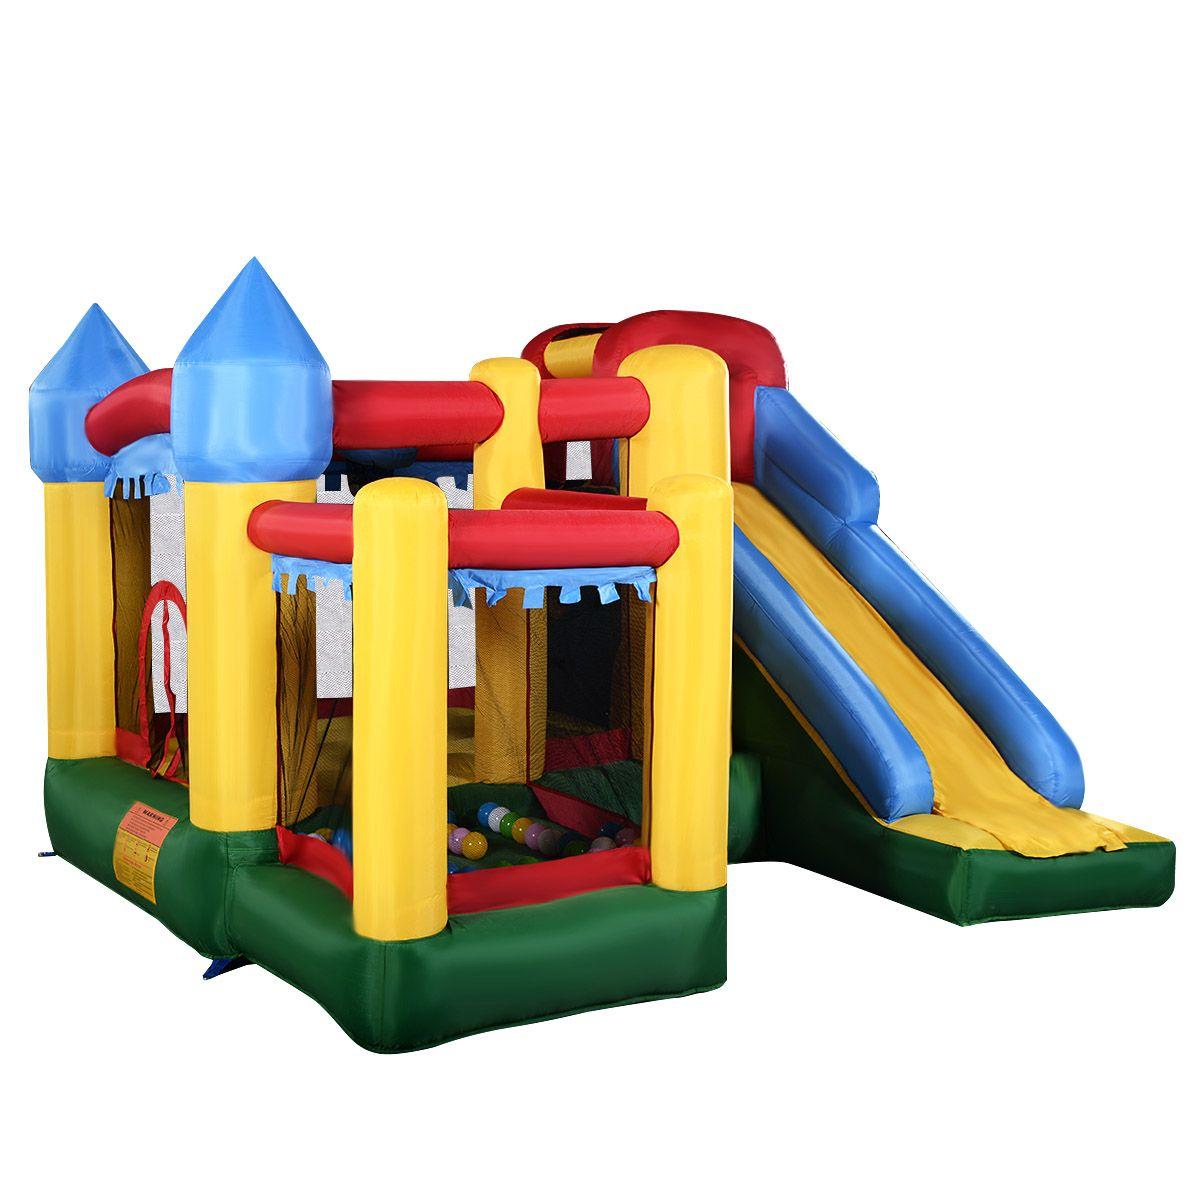 004d01600 Generic Inflatable Bounce House Castle Commercial Kids Jumper ...